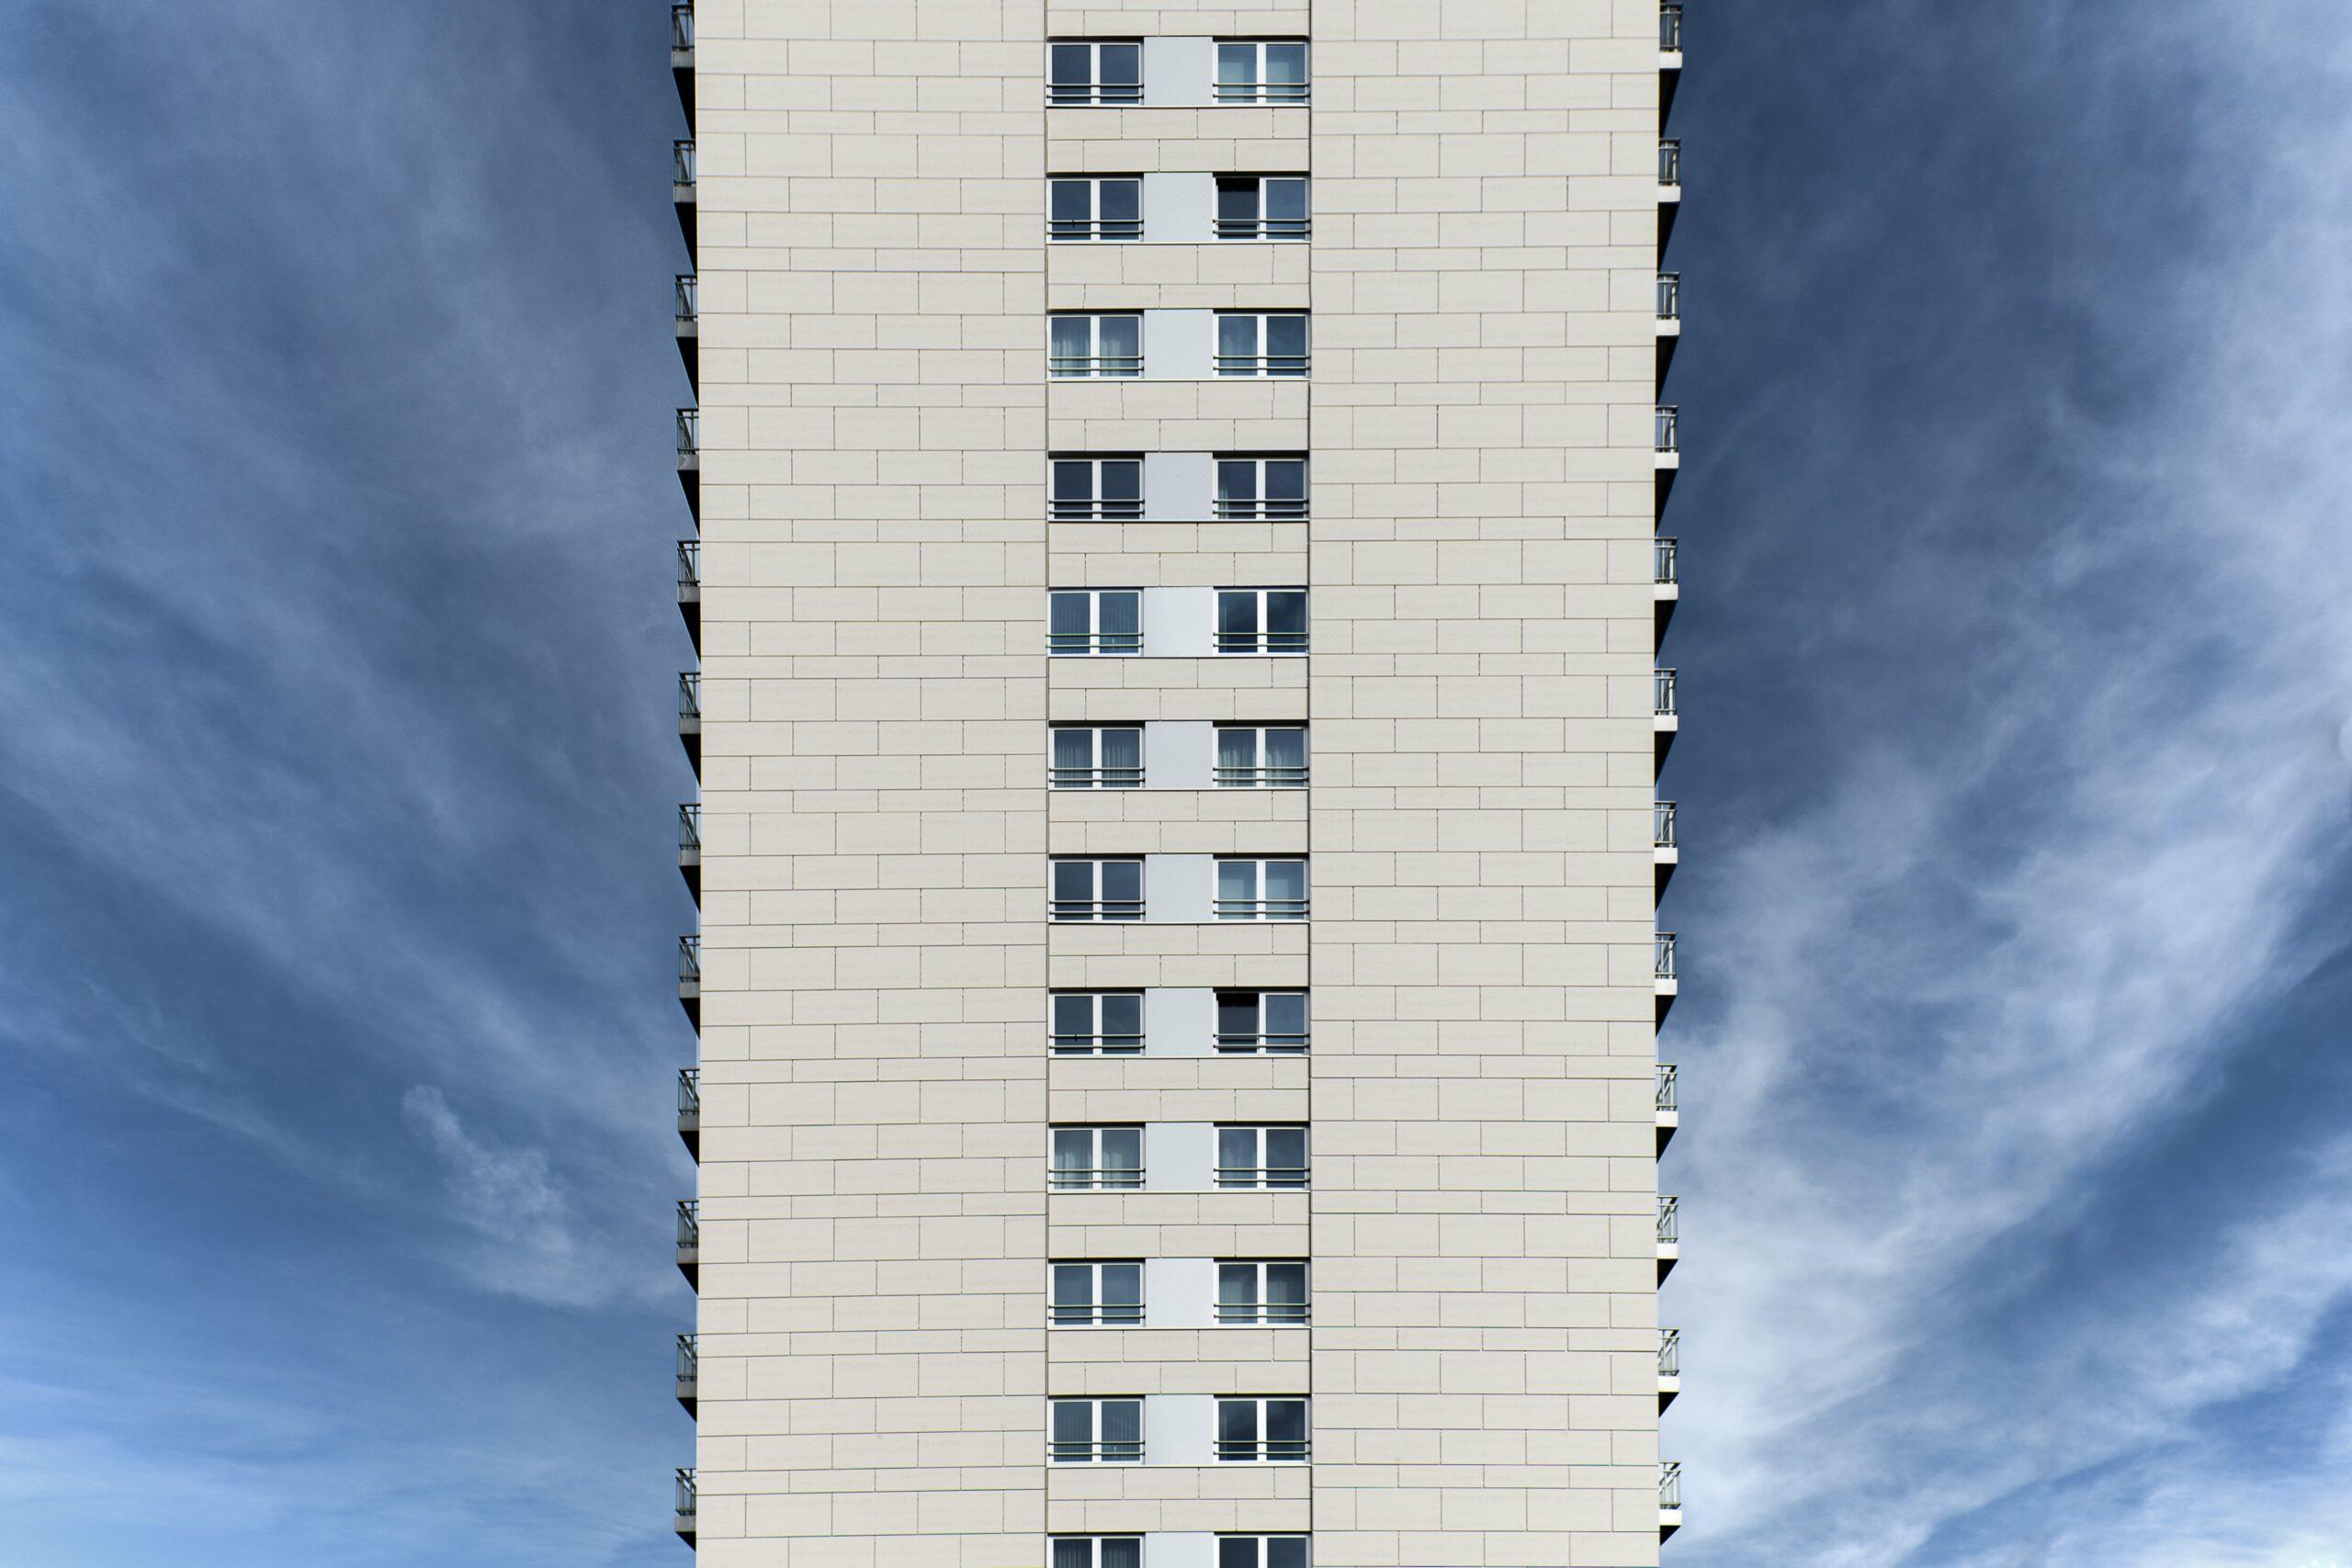 Torre Hooghe  - Cosentino tHoogheHuysAntwerpen PhotobyOrianaGomez Zerpa 300ppi 9 min scaled 39